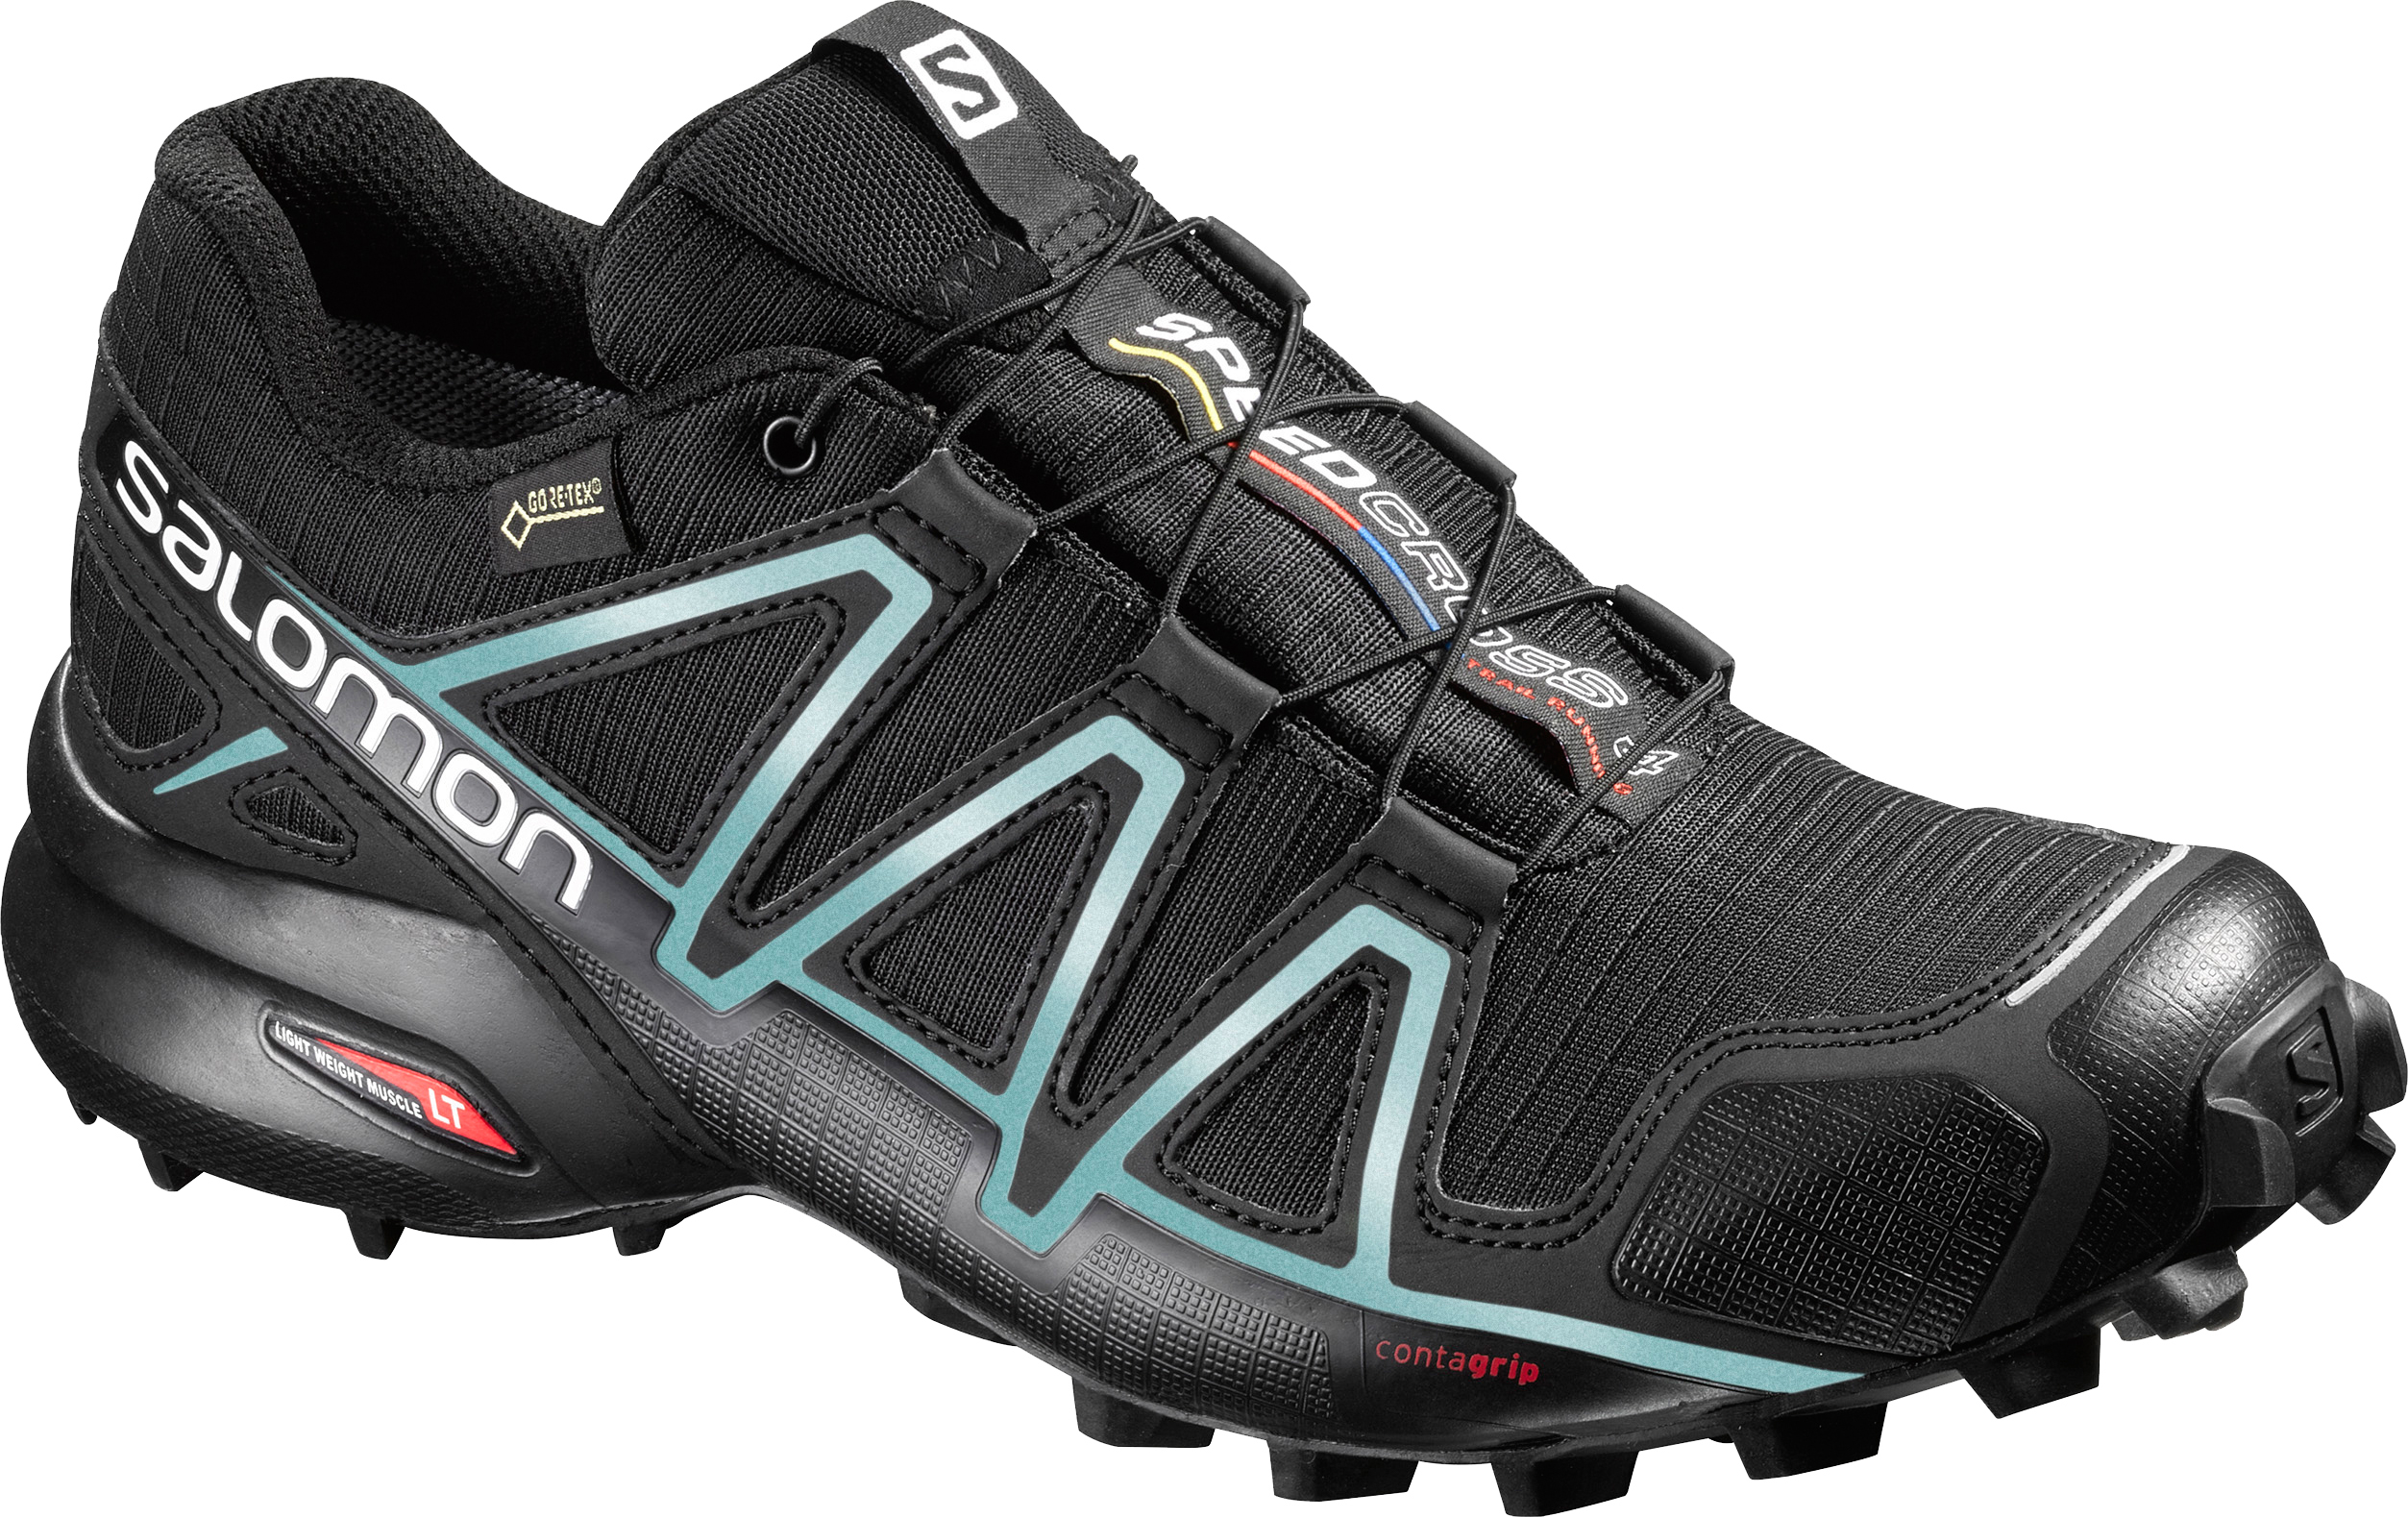 0ce9c179b Salomon Speedcross 4 GTX Trail Running Shoes - Women s